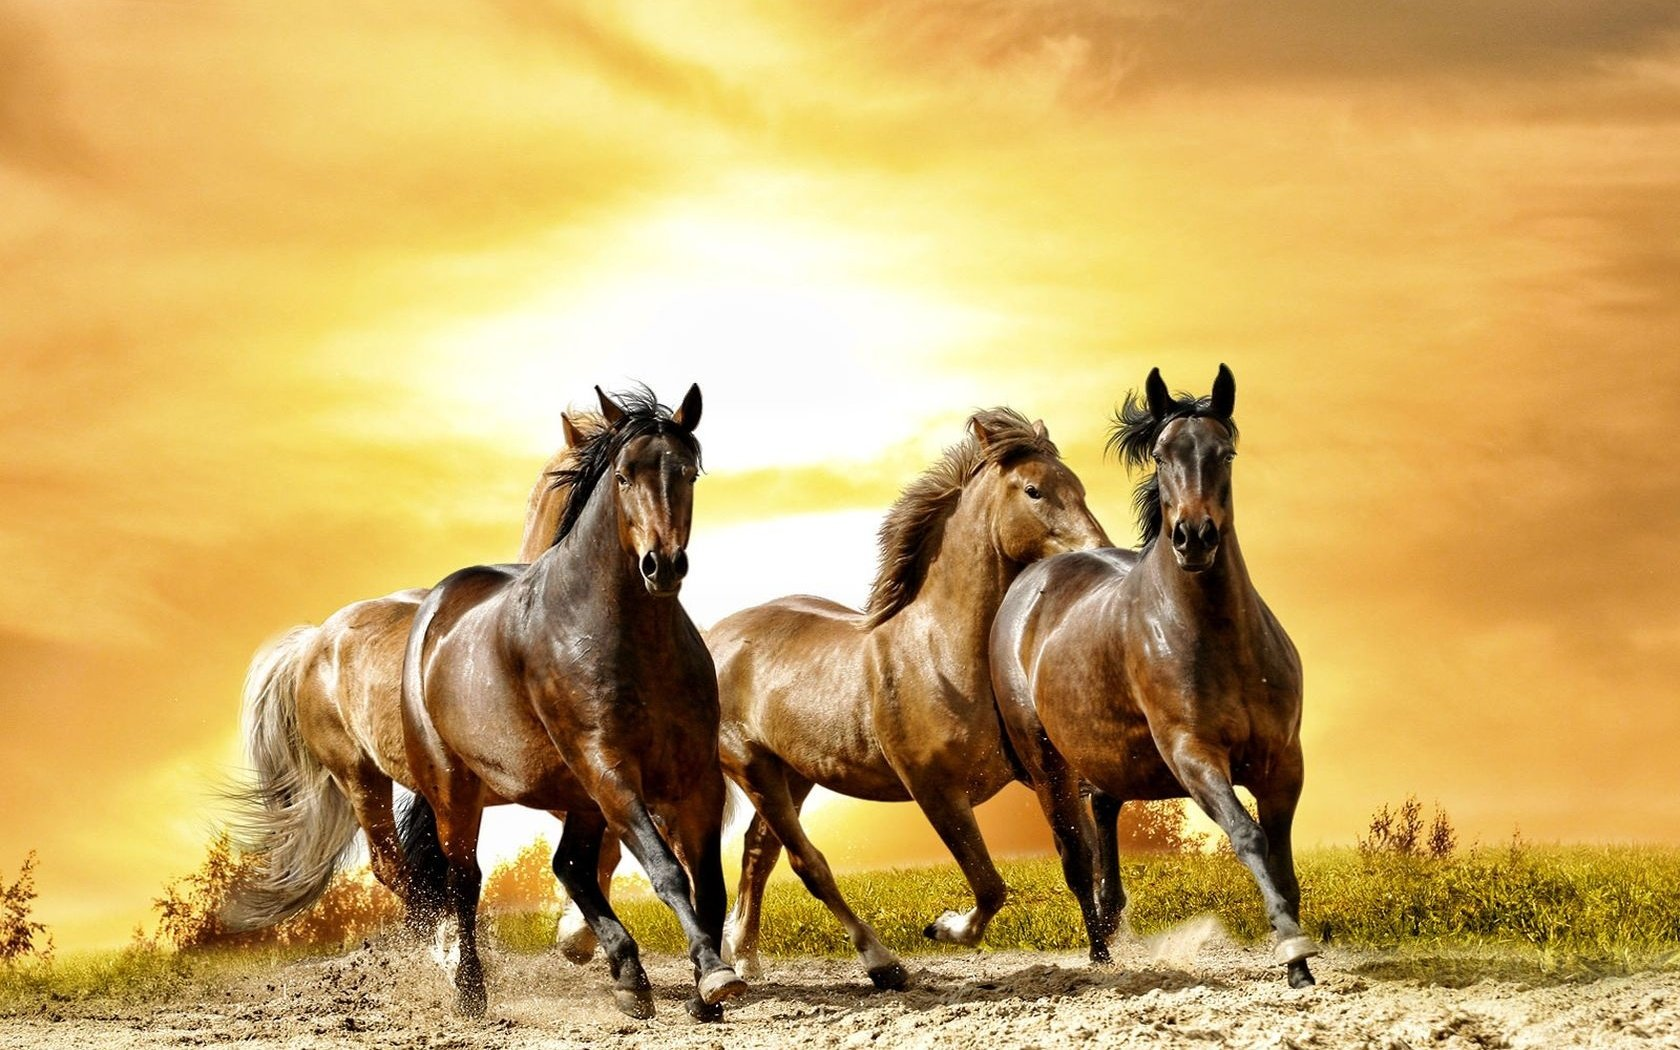 Running Horses Wallpaper - WallpaperSafari